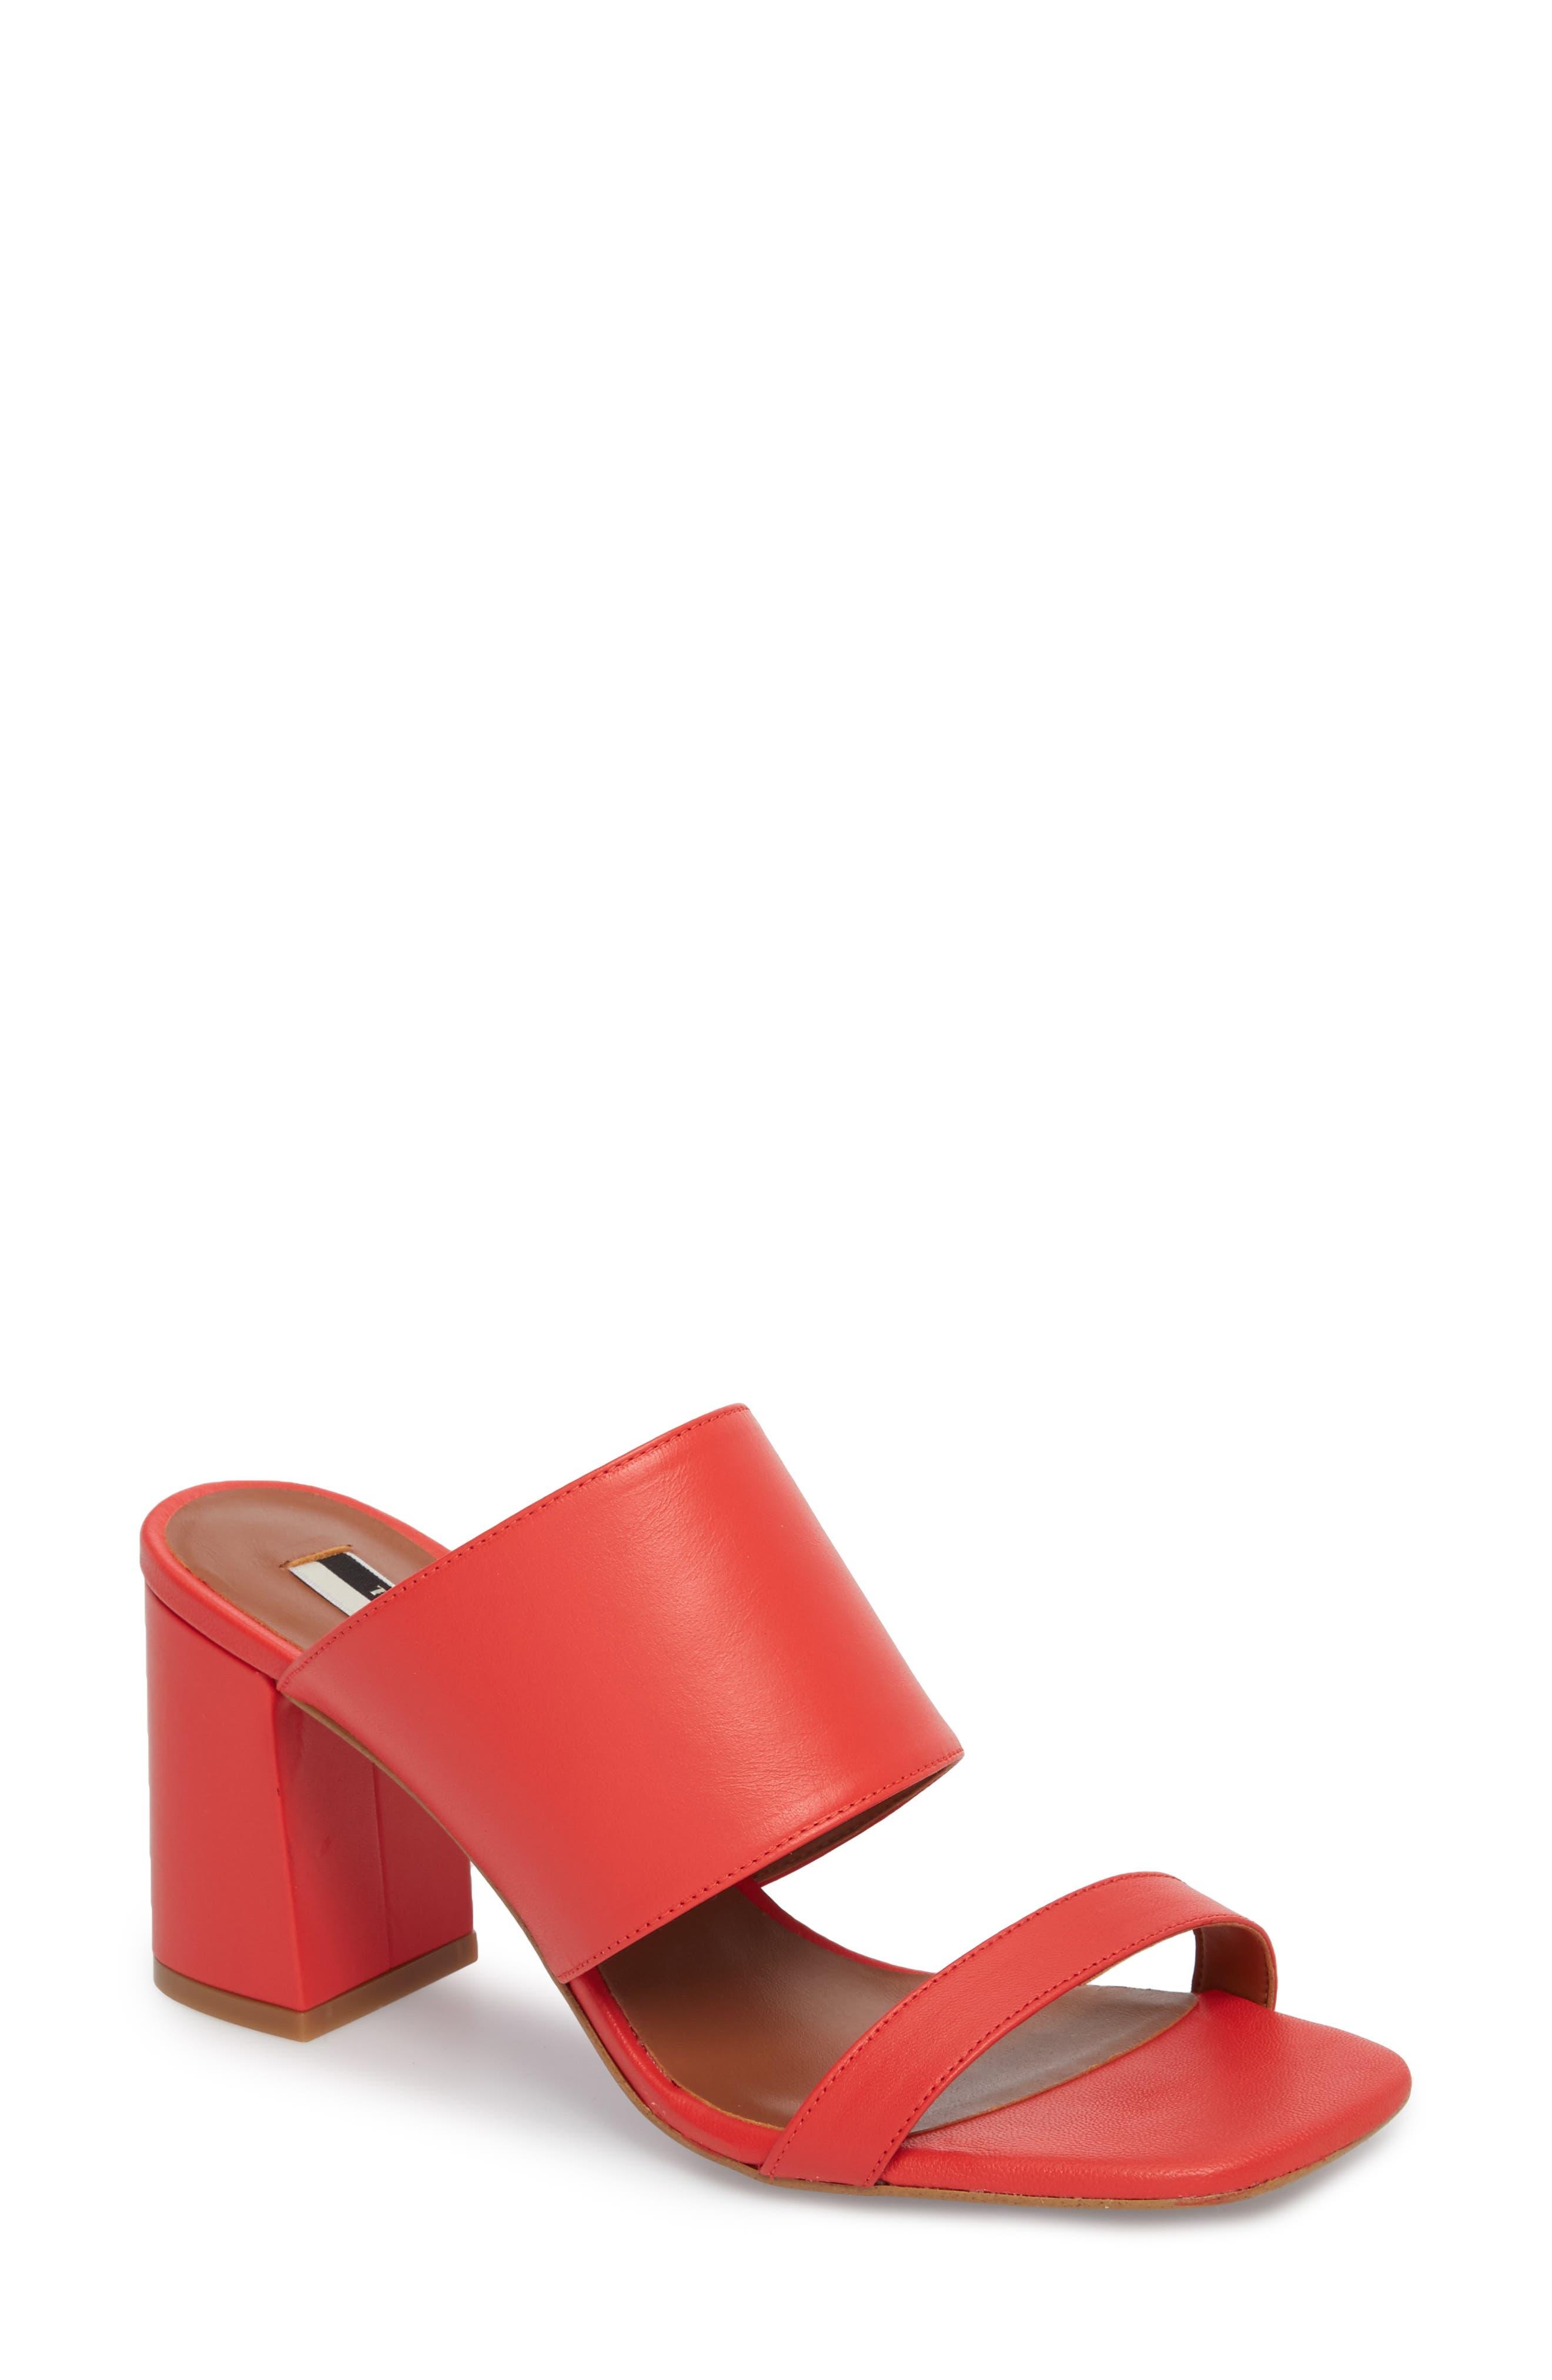 Main Image - Topshop Nickle Mule Sandal (Women)